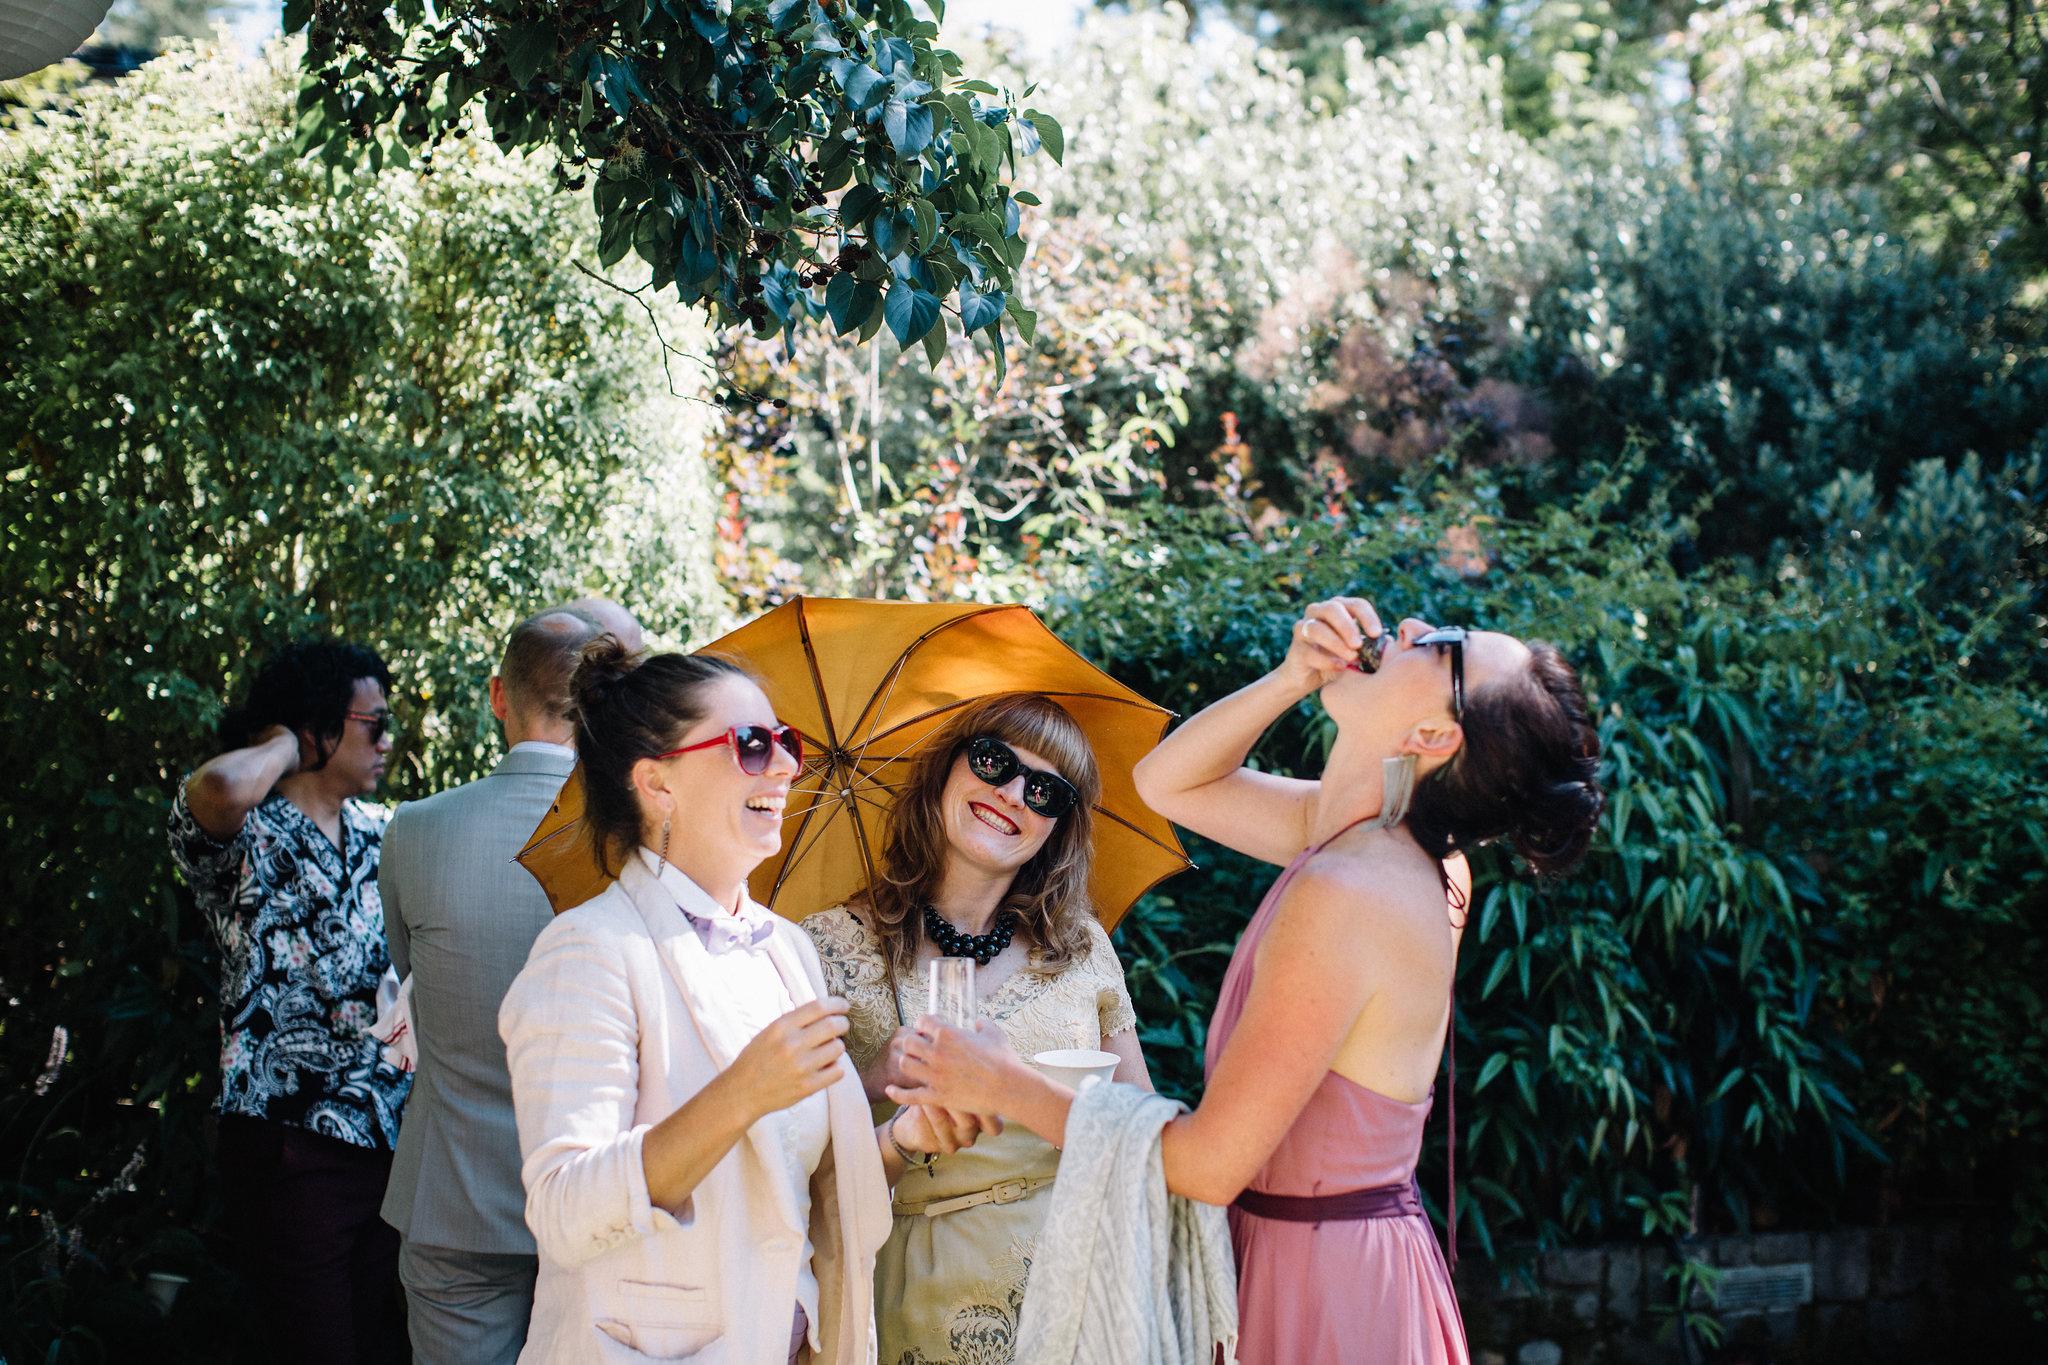 20170708_Brook+Evans_wedding_highres-185.jpg